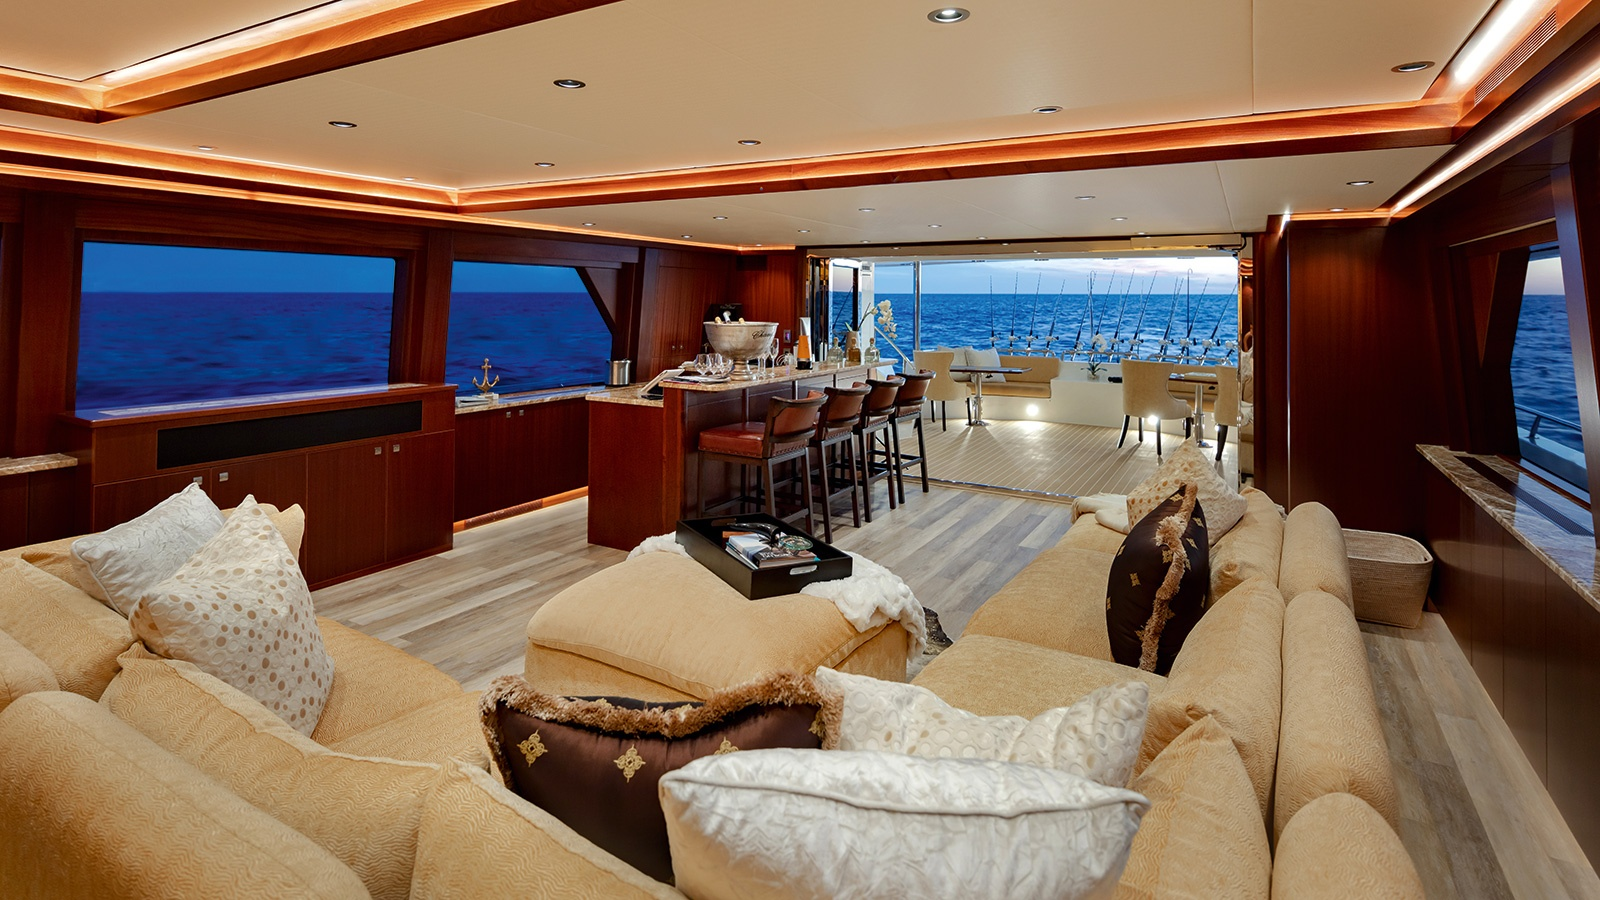 3027.Normandie Transtlantic Ship Travel POSTER.Art decoration home room office